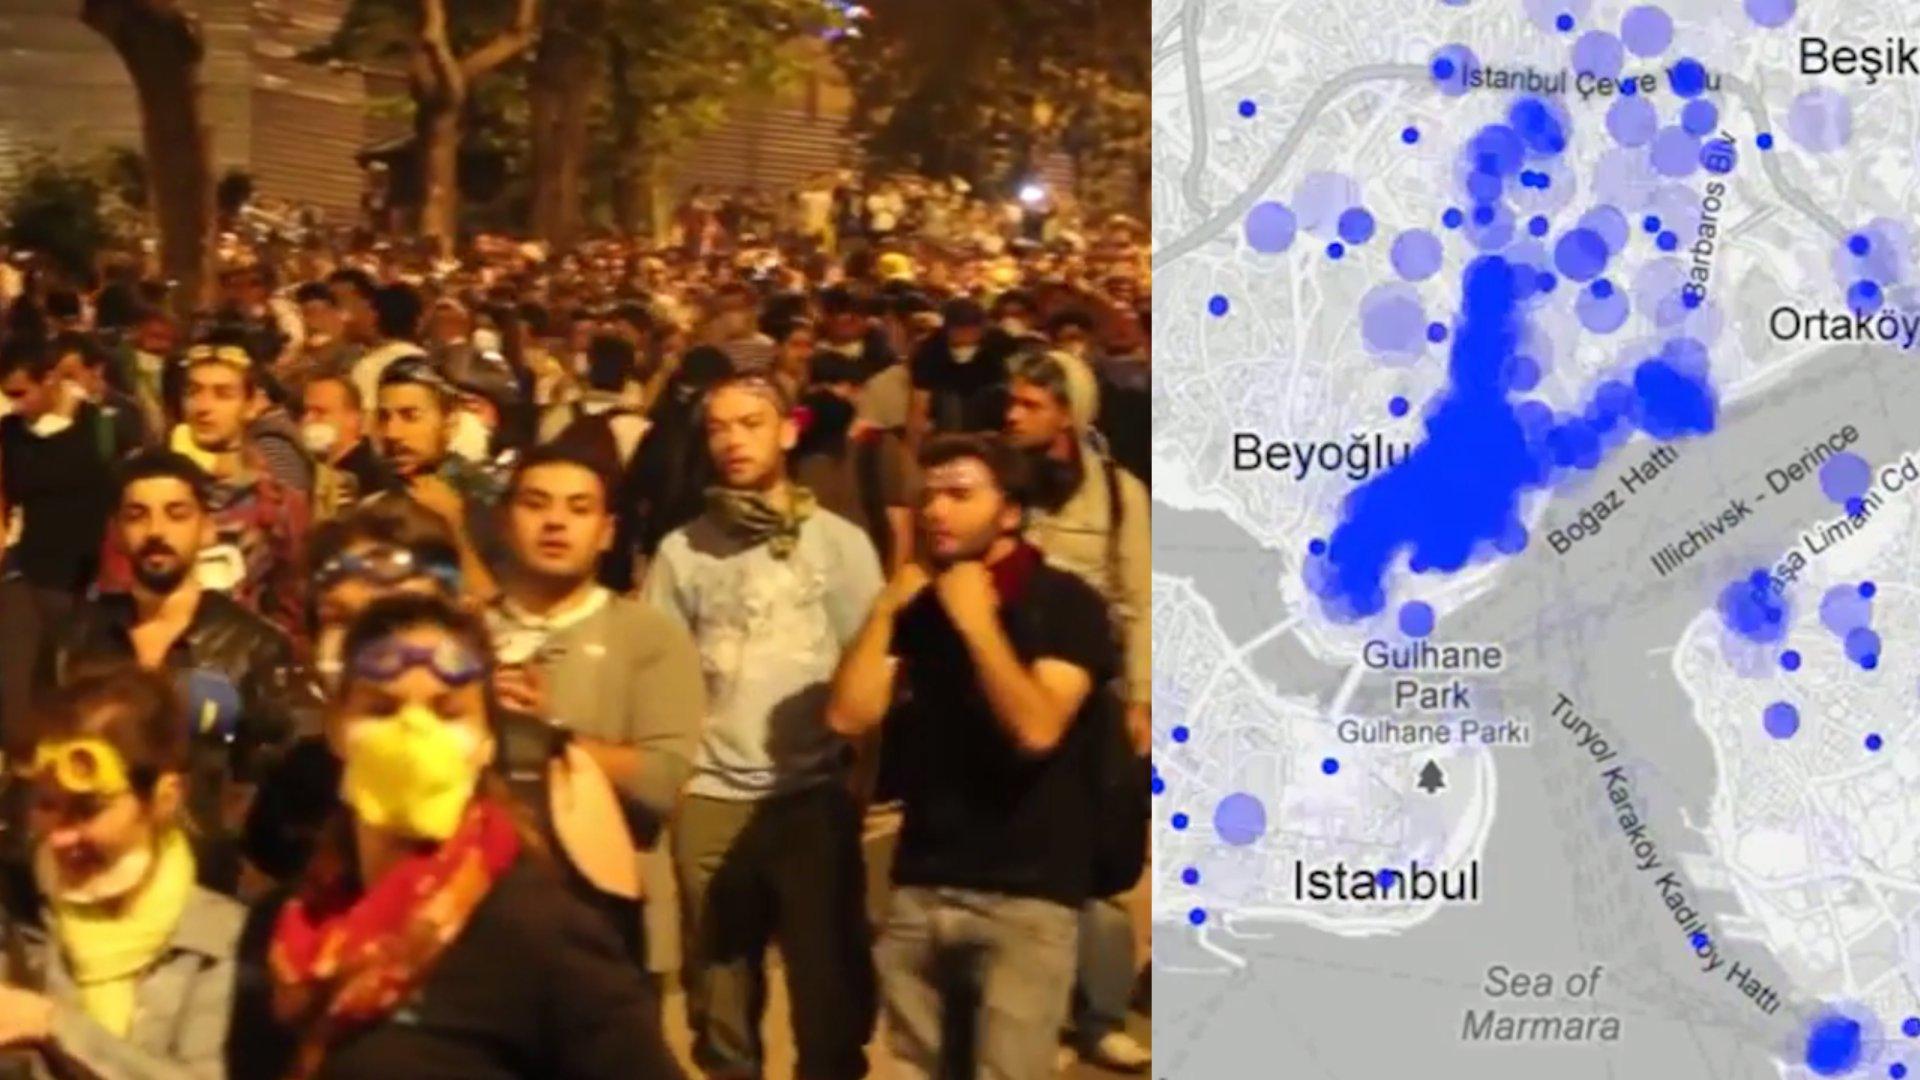 Politik im Netz: Social Media in der Türkei | Cemcorder